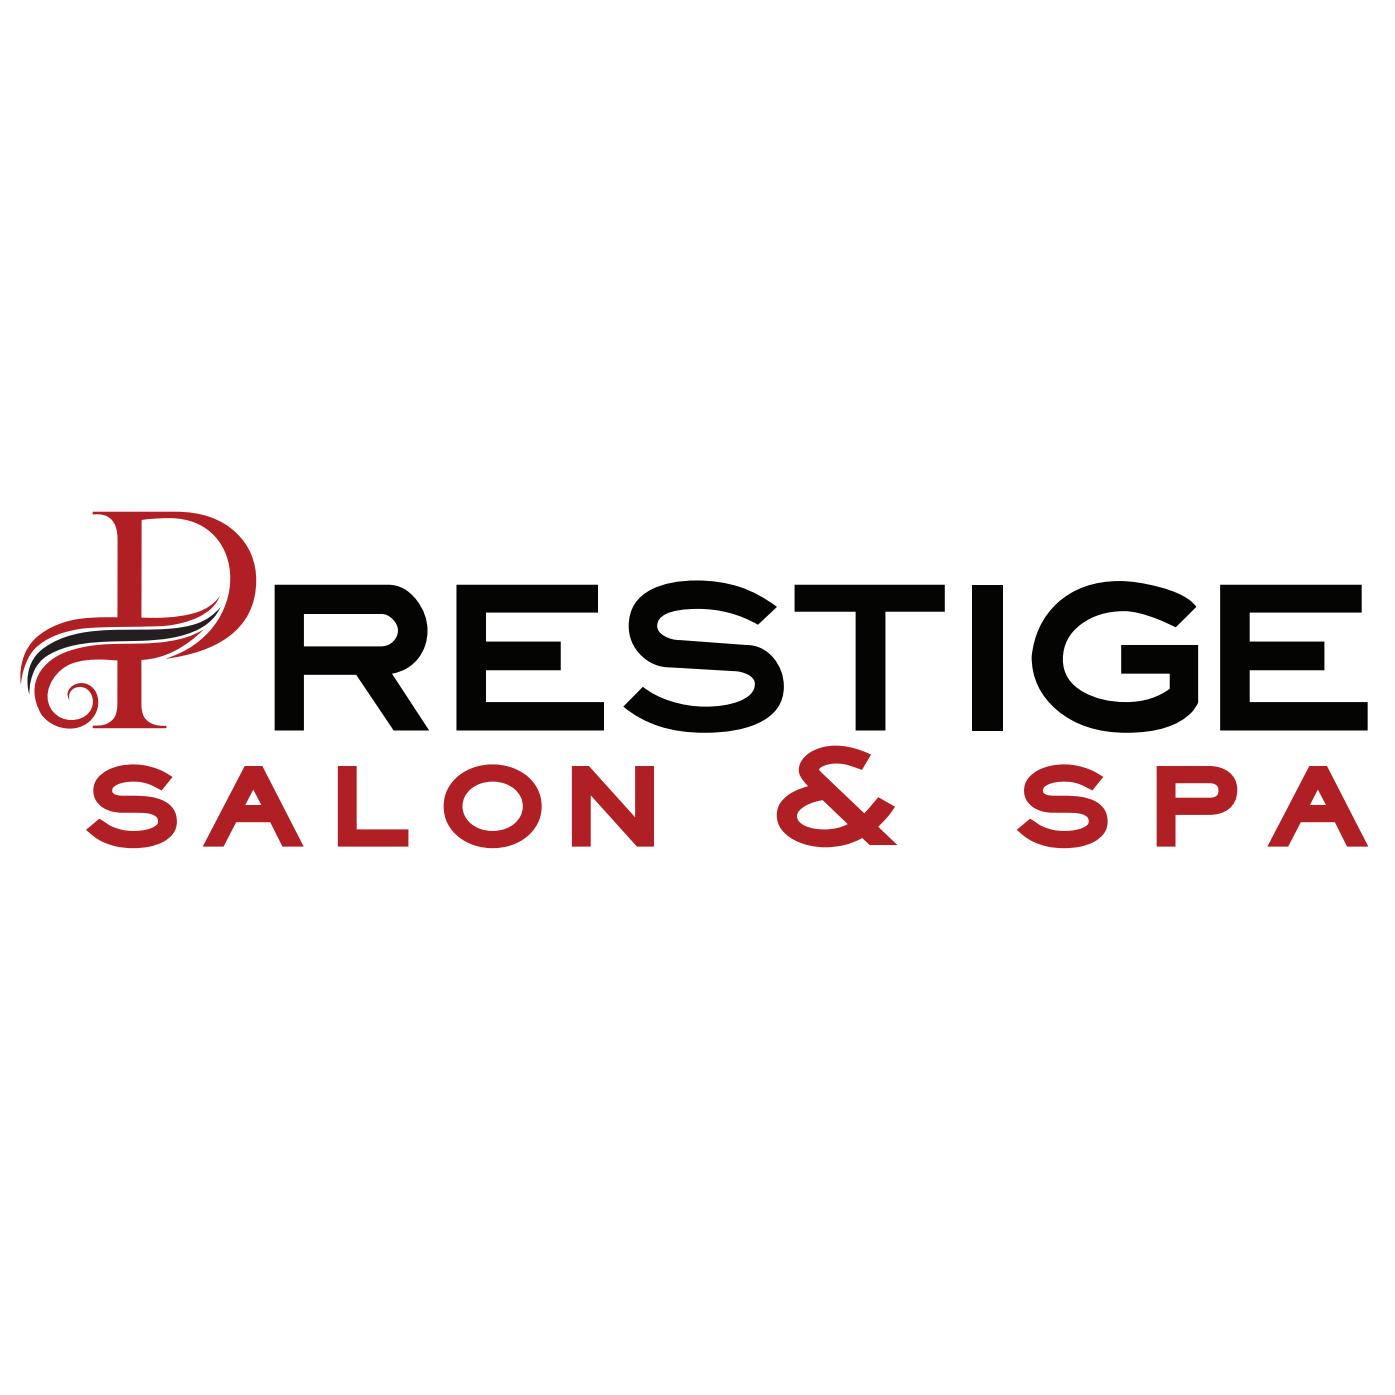 Prestige Salon & Spa